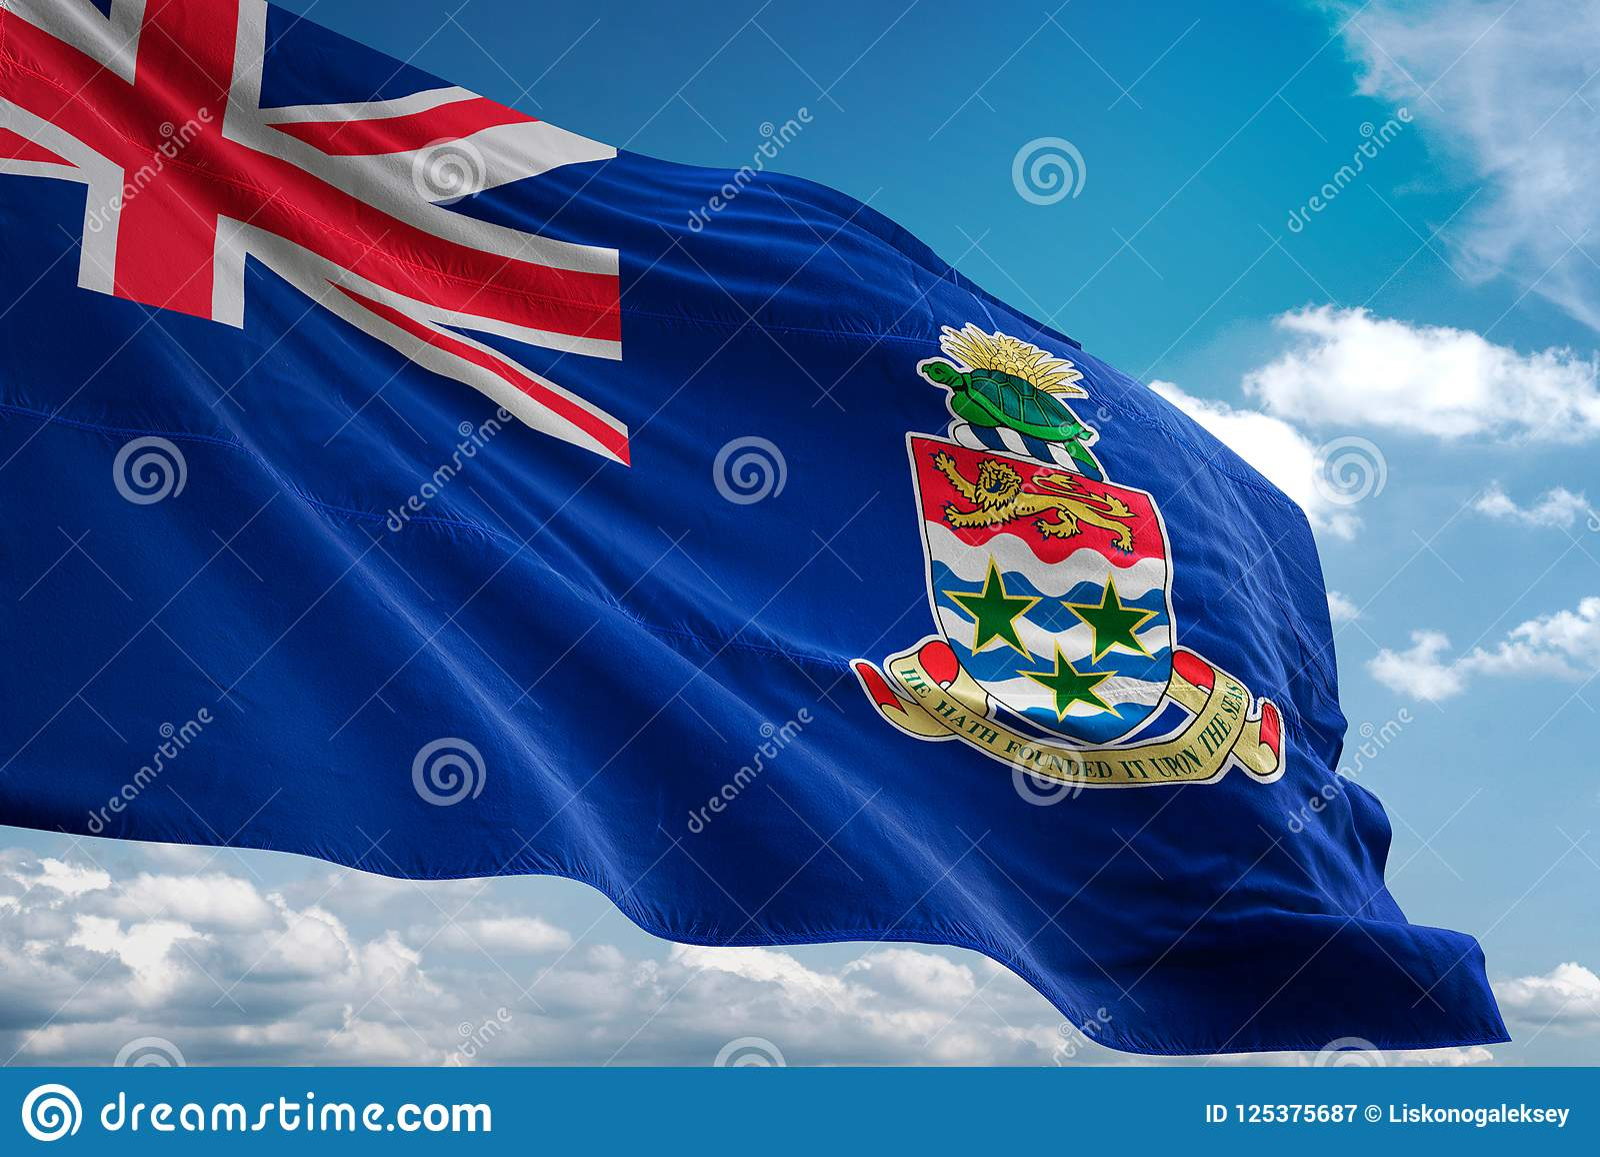 Cayman Islands National Flag Waving Blue Sky Background